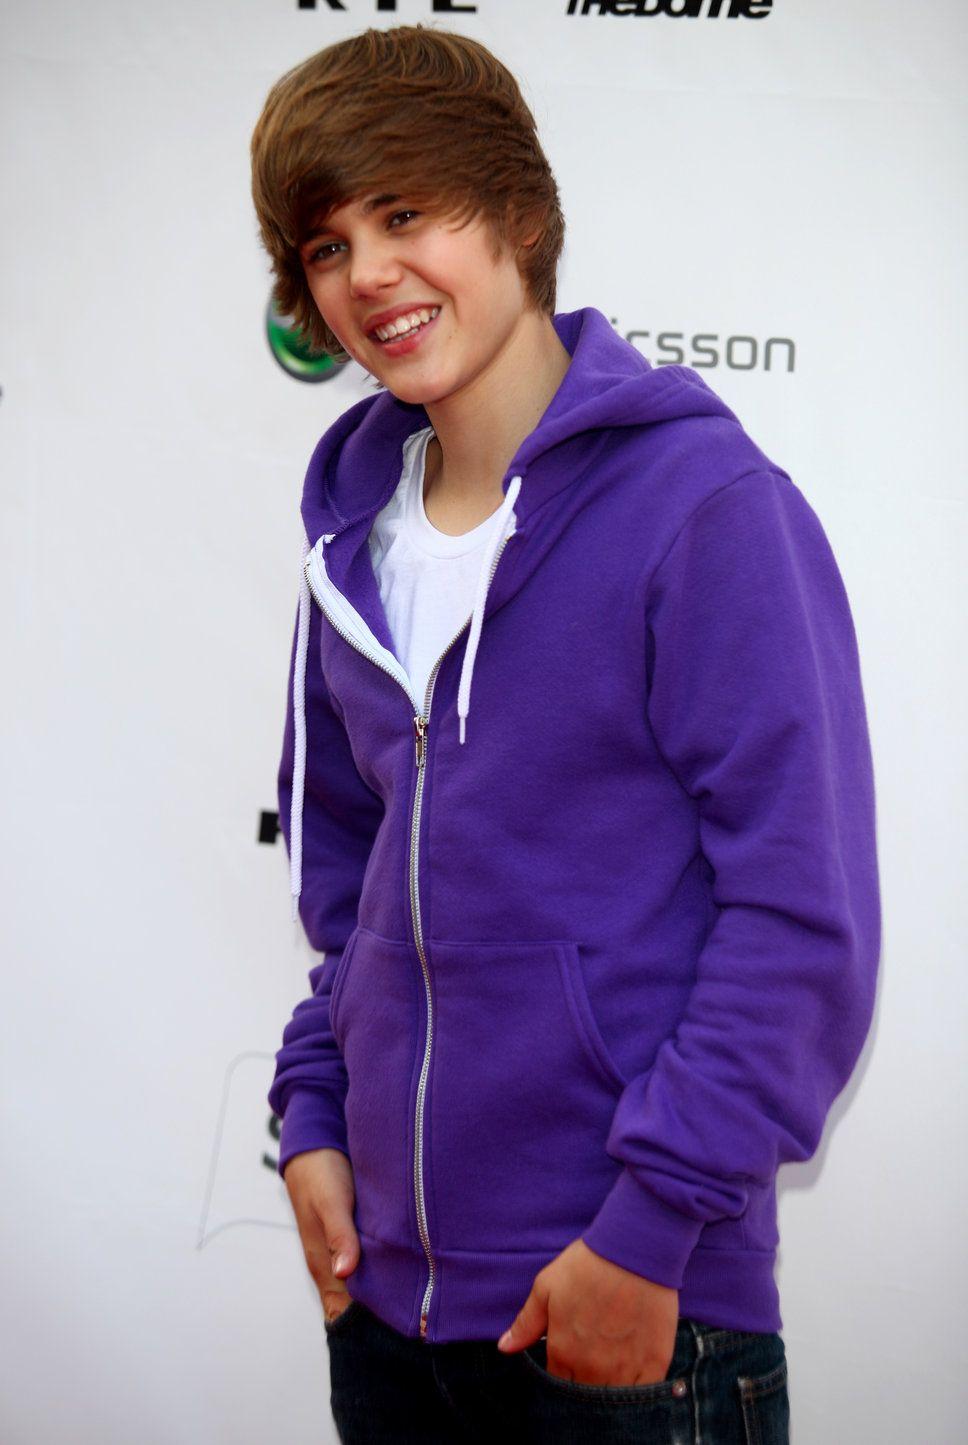 Justin Bieber haircut style 2014   neyhafashion.com ...